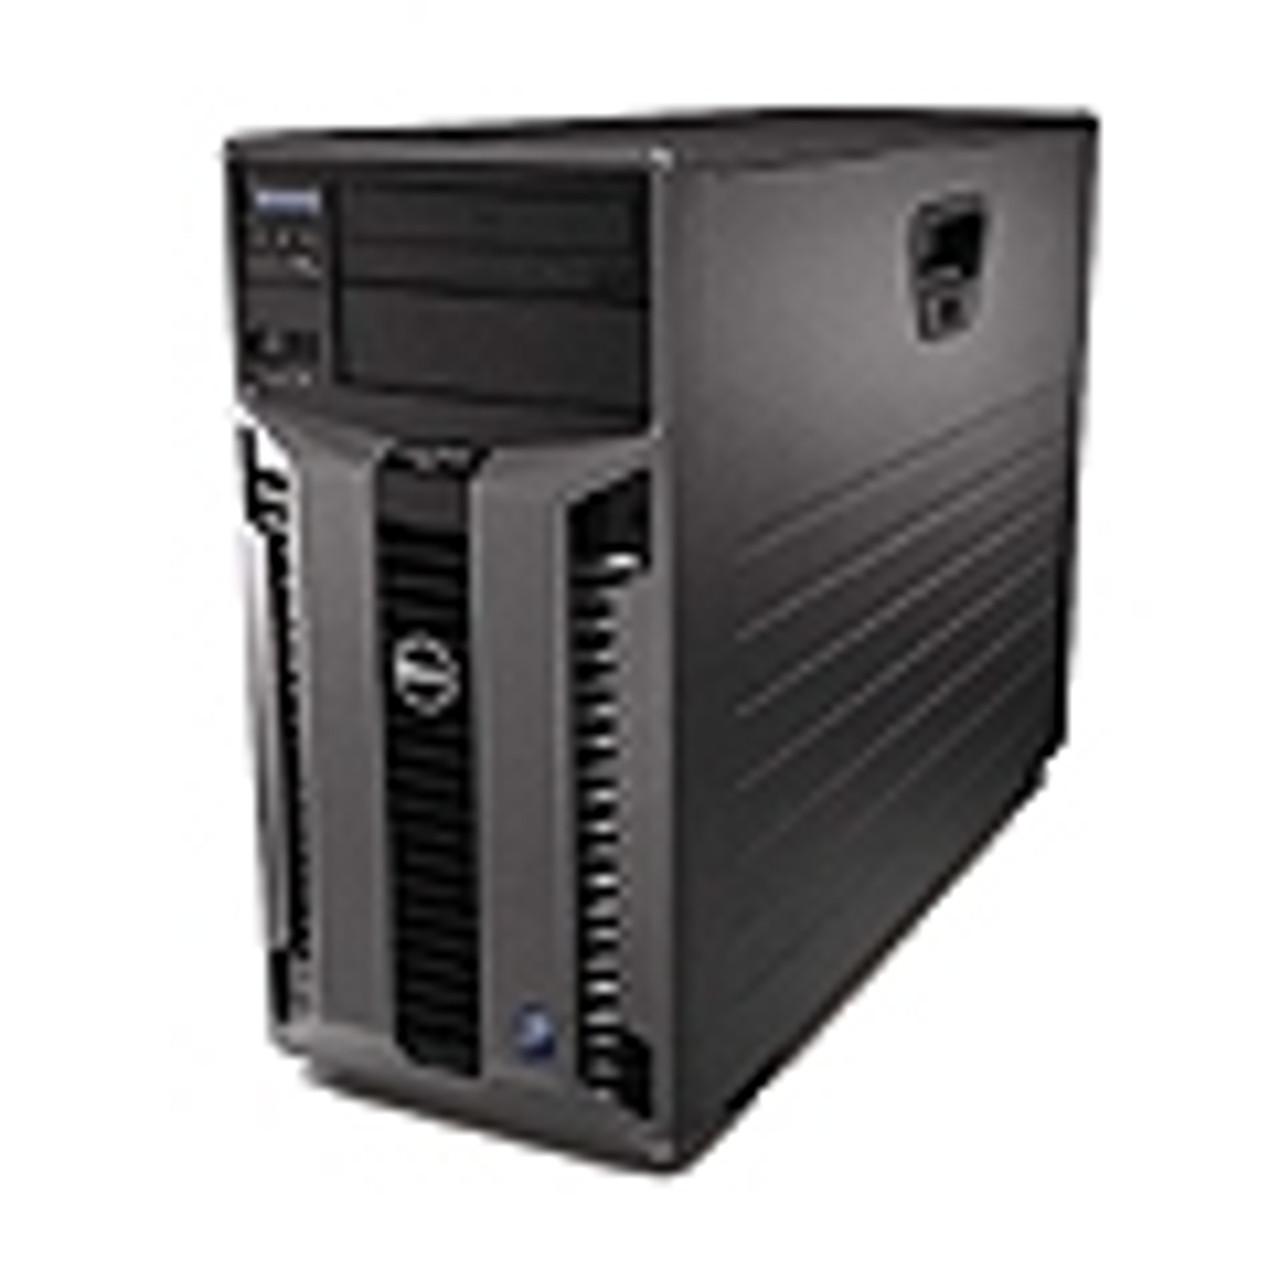 Dell PowerEdge T610 Servers